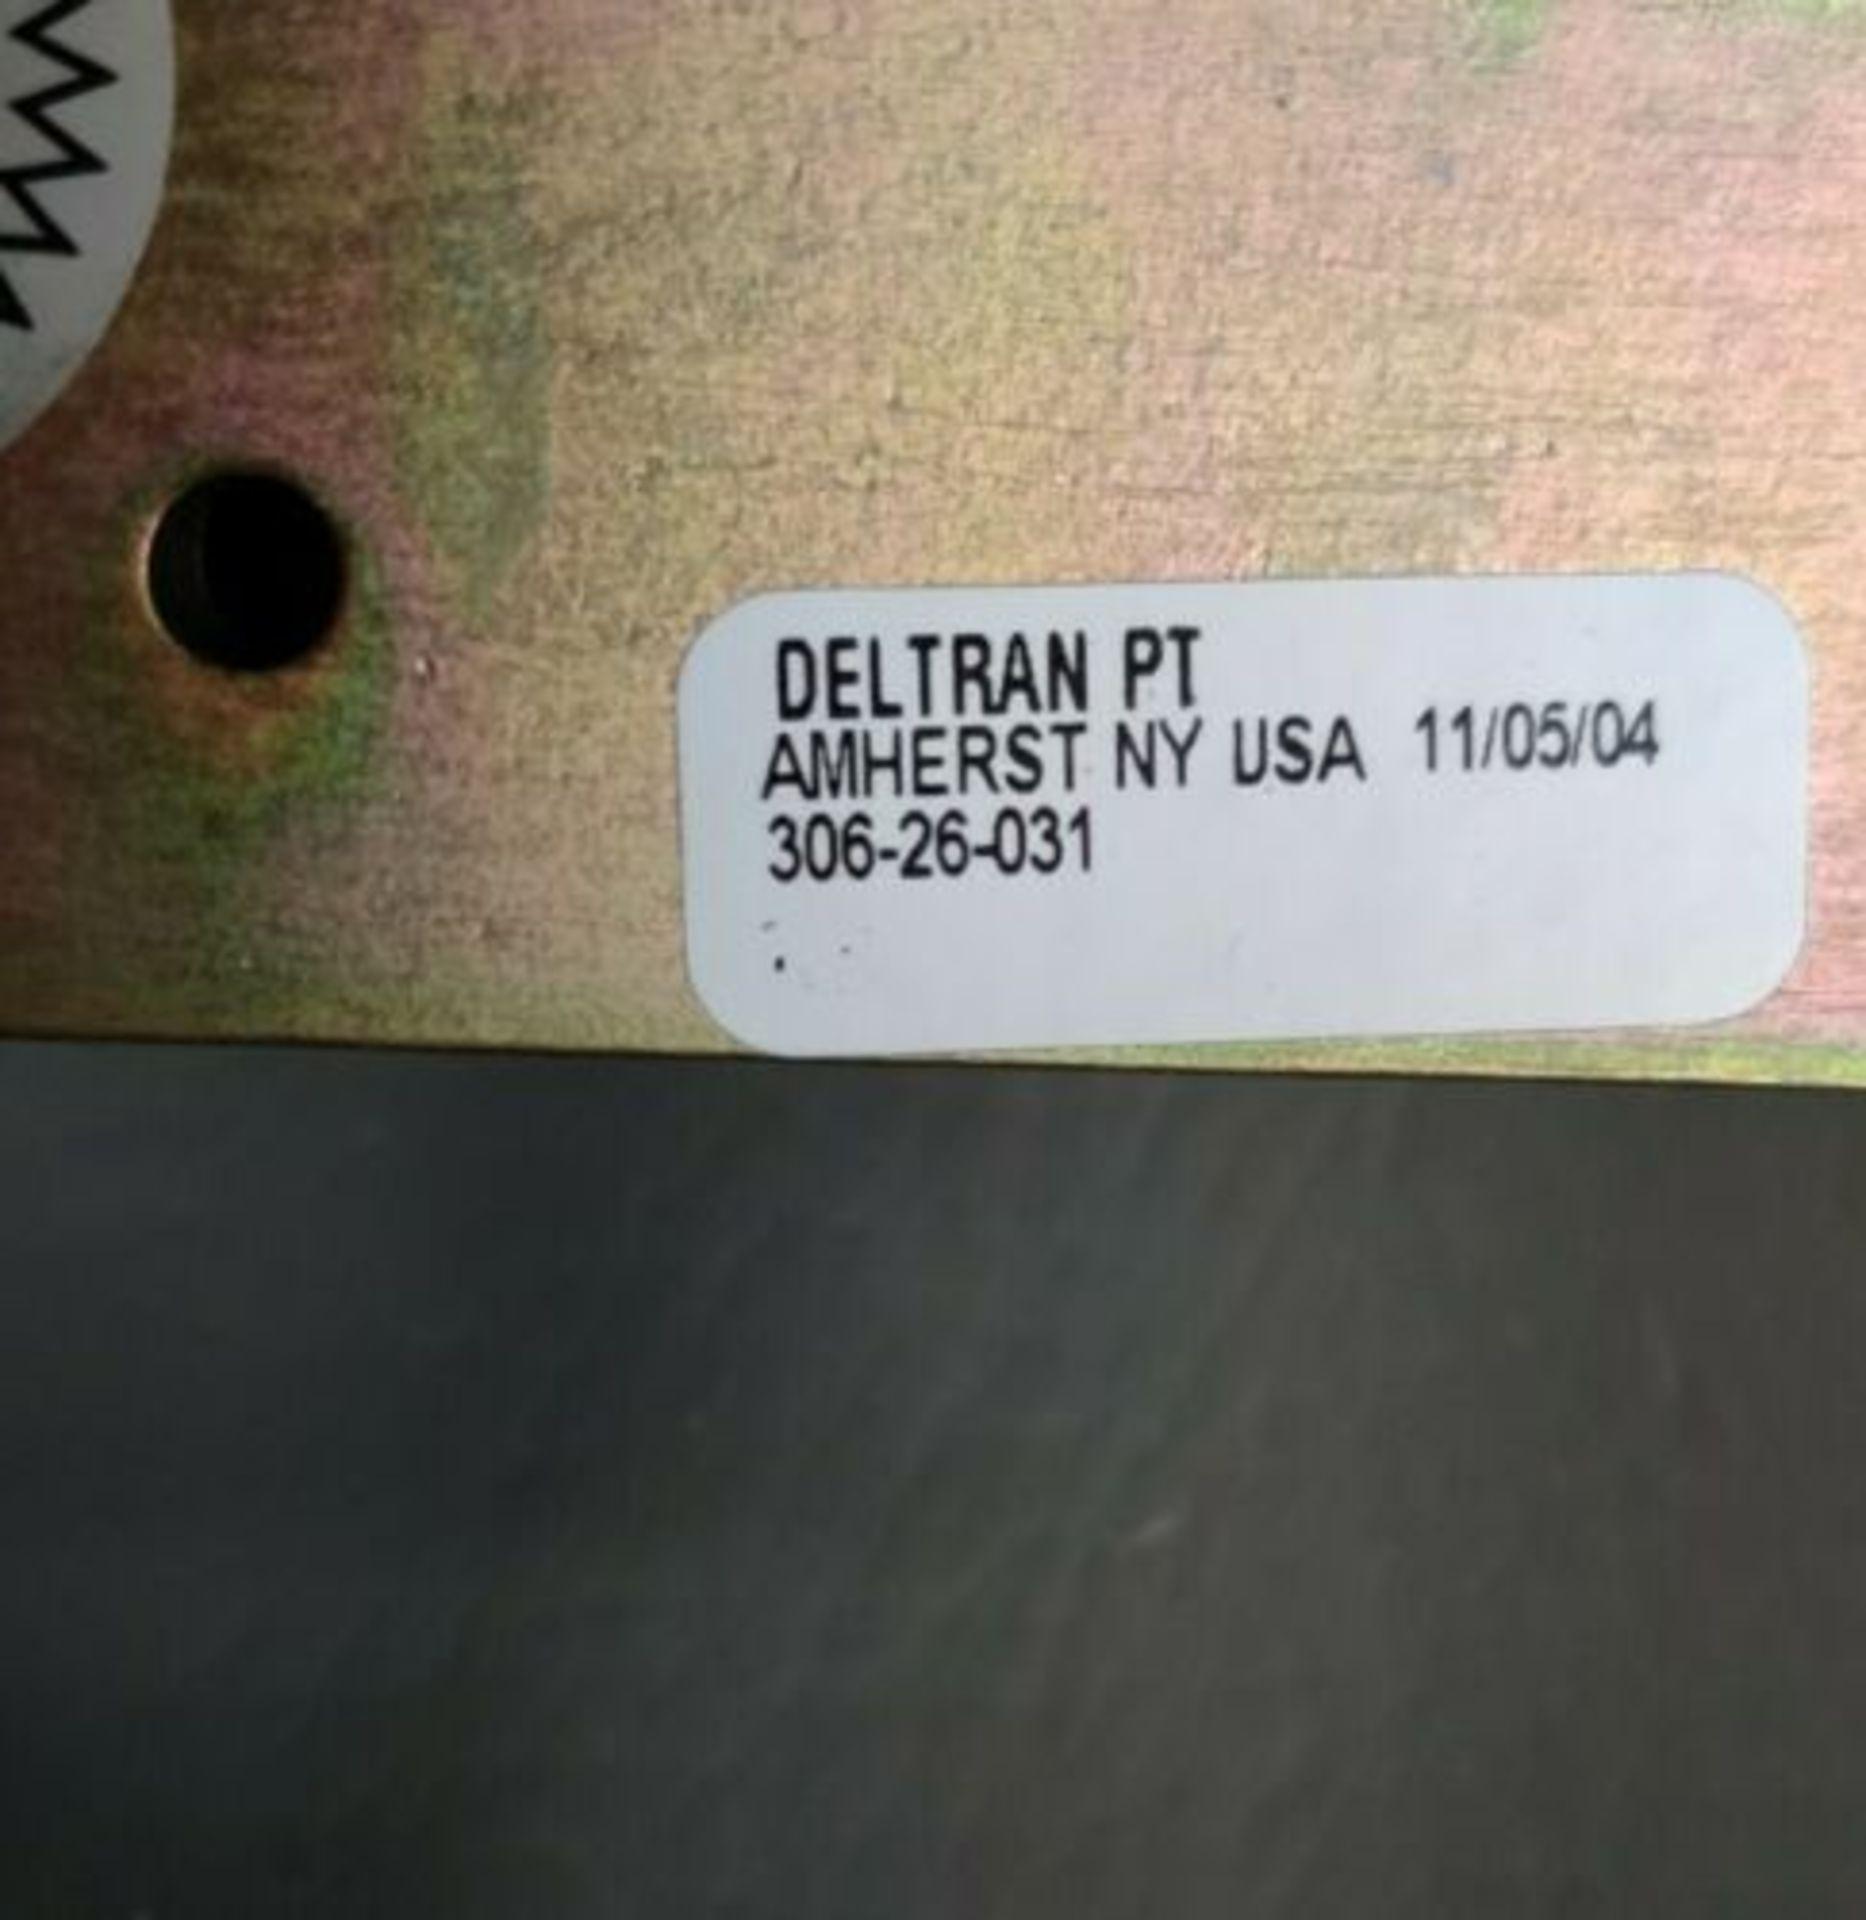 UNUSED DELTRAN SPRING CLUTCH - Image 4 of 4